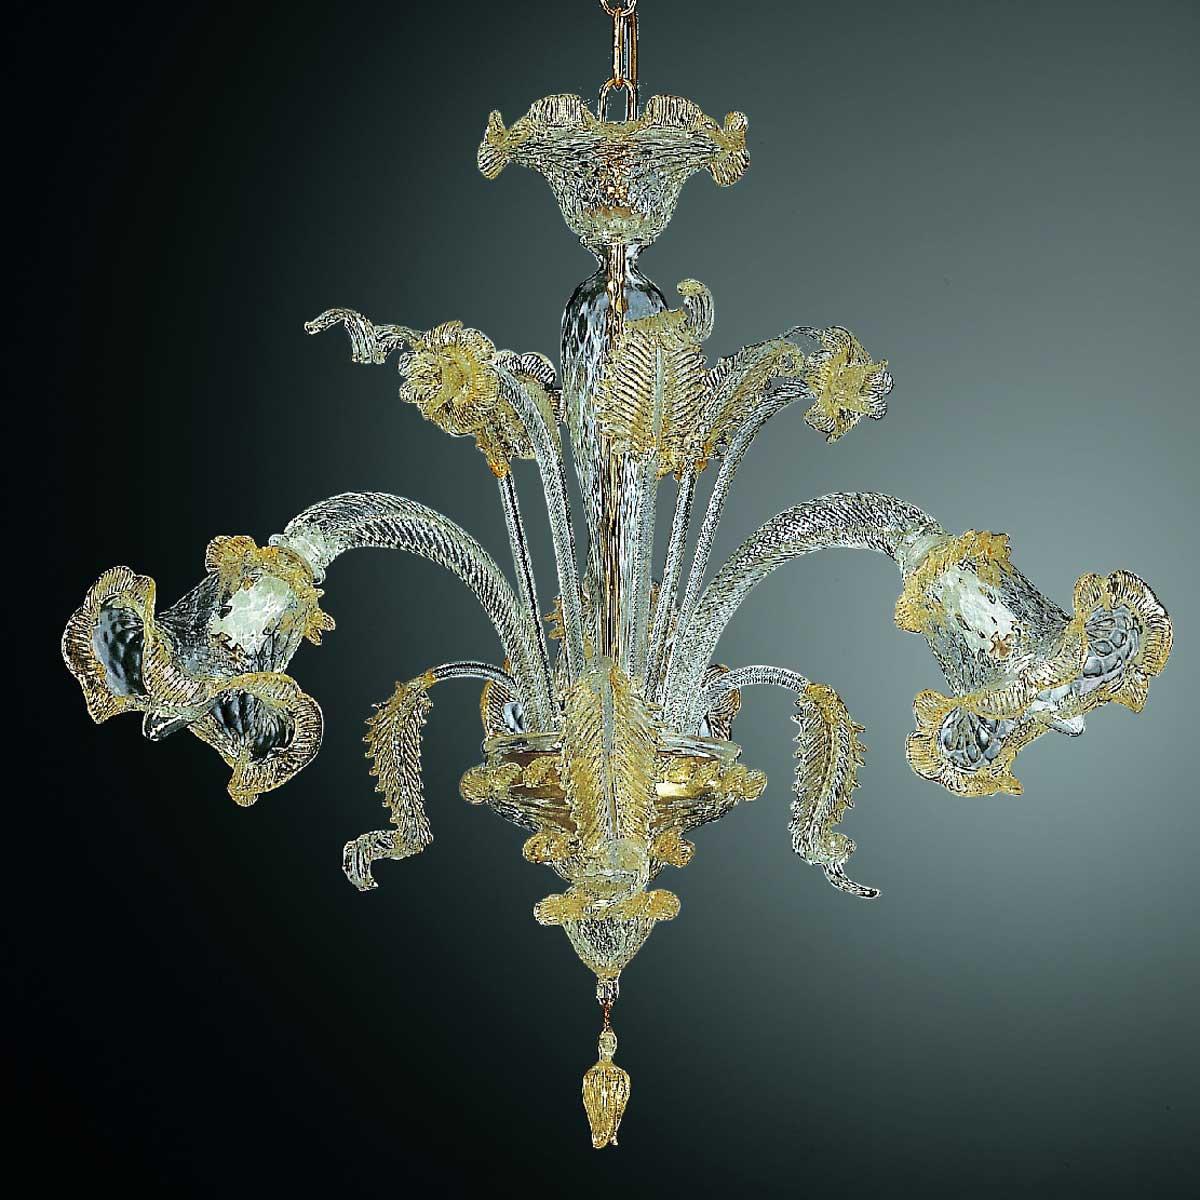 Canal Grande 3 luces lampara de Murano - color transparente oro